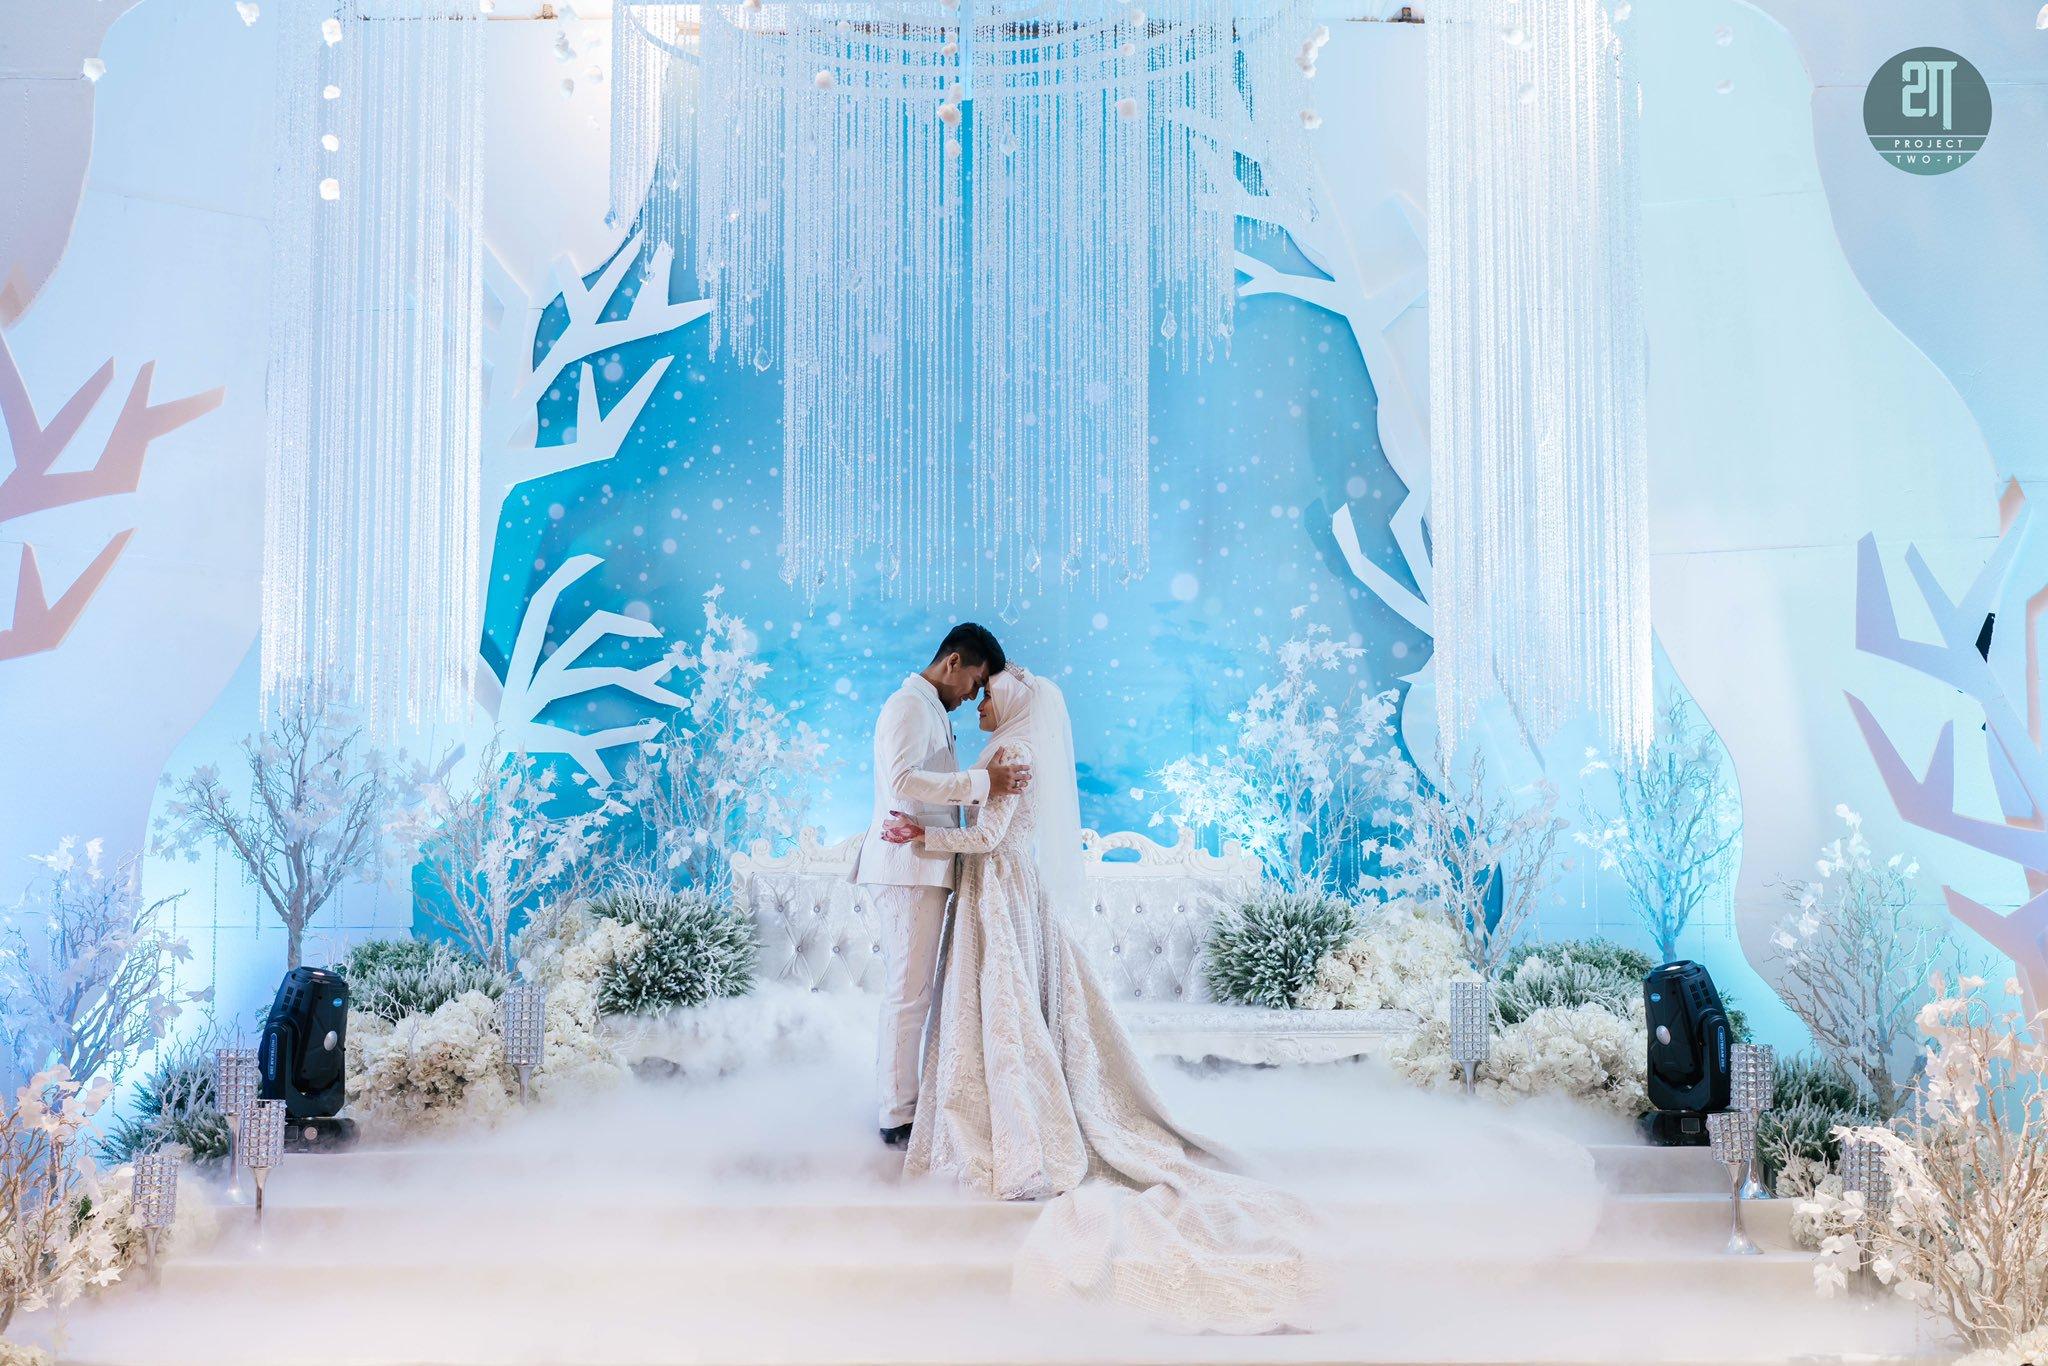 [VIDEO] Abang Tak Hadir Wedding, Eyra Hazali Terus Nangis Bila Ada Kejutan Lain